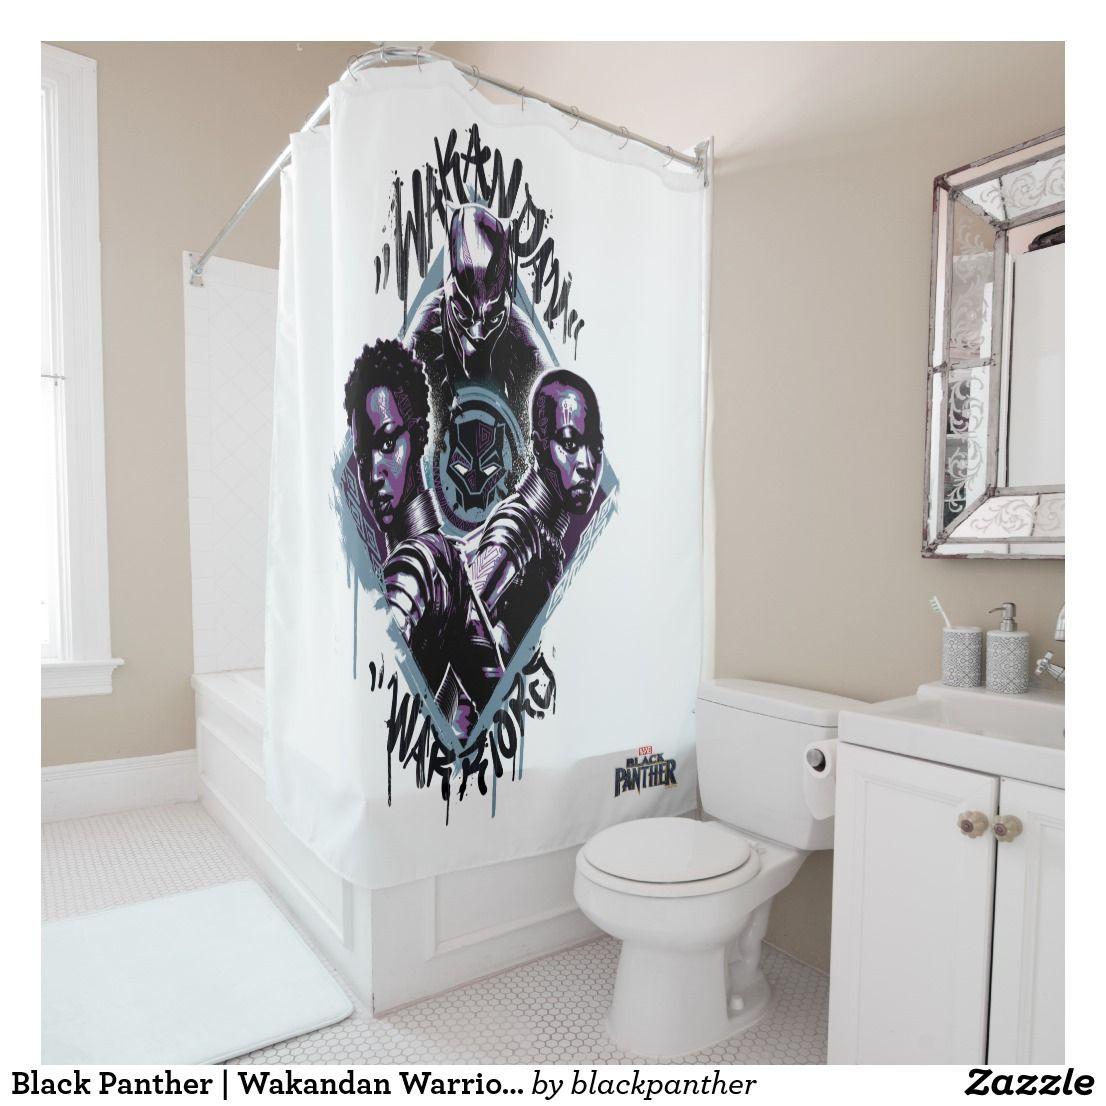 Black Panther Wakandan Warriors Graffiti Shower Curtain Zazzle